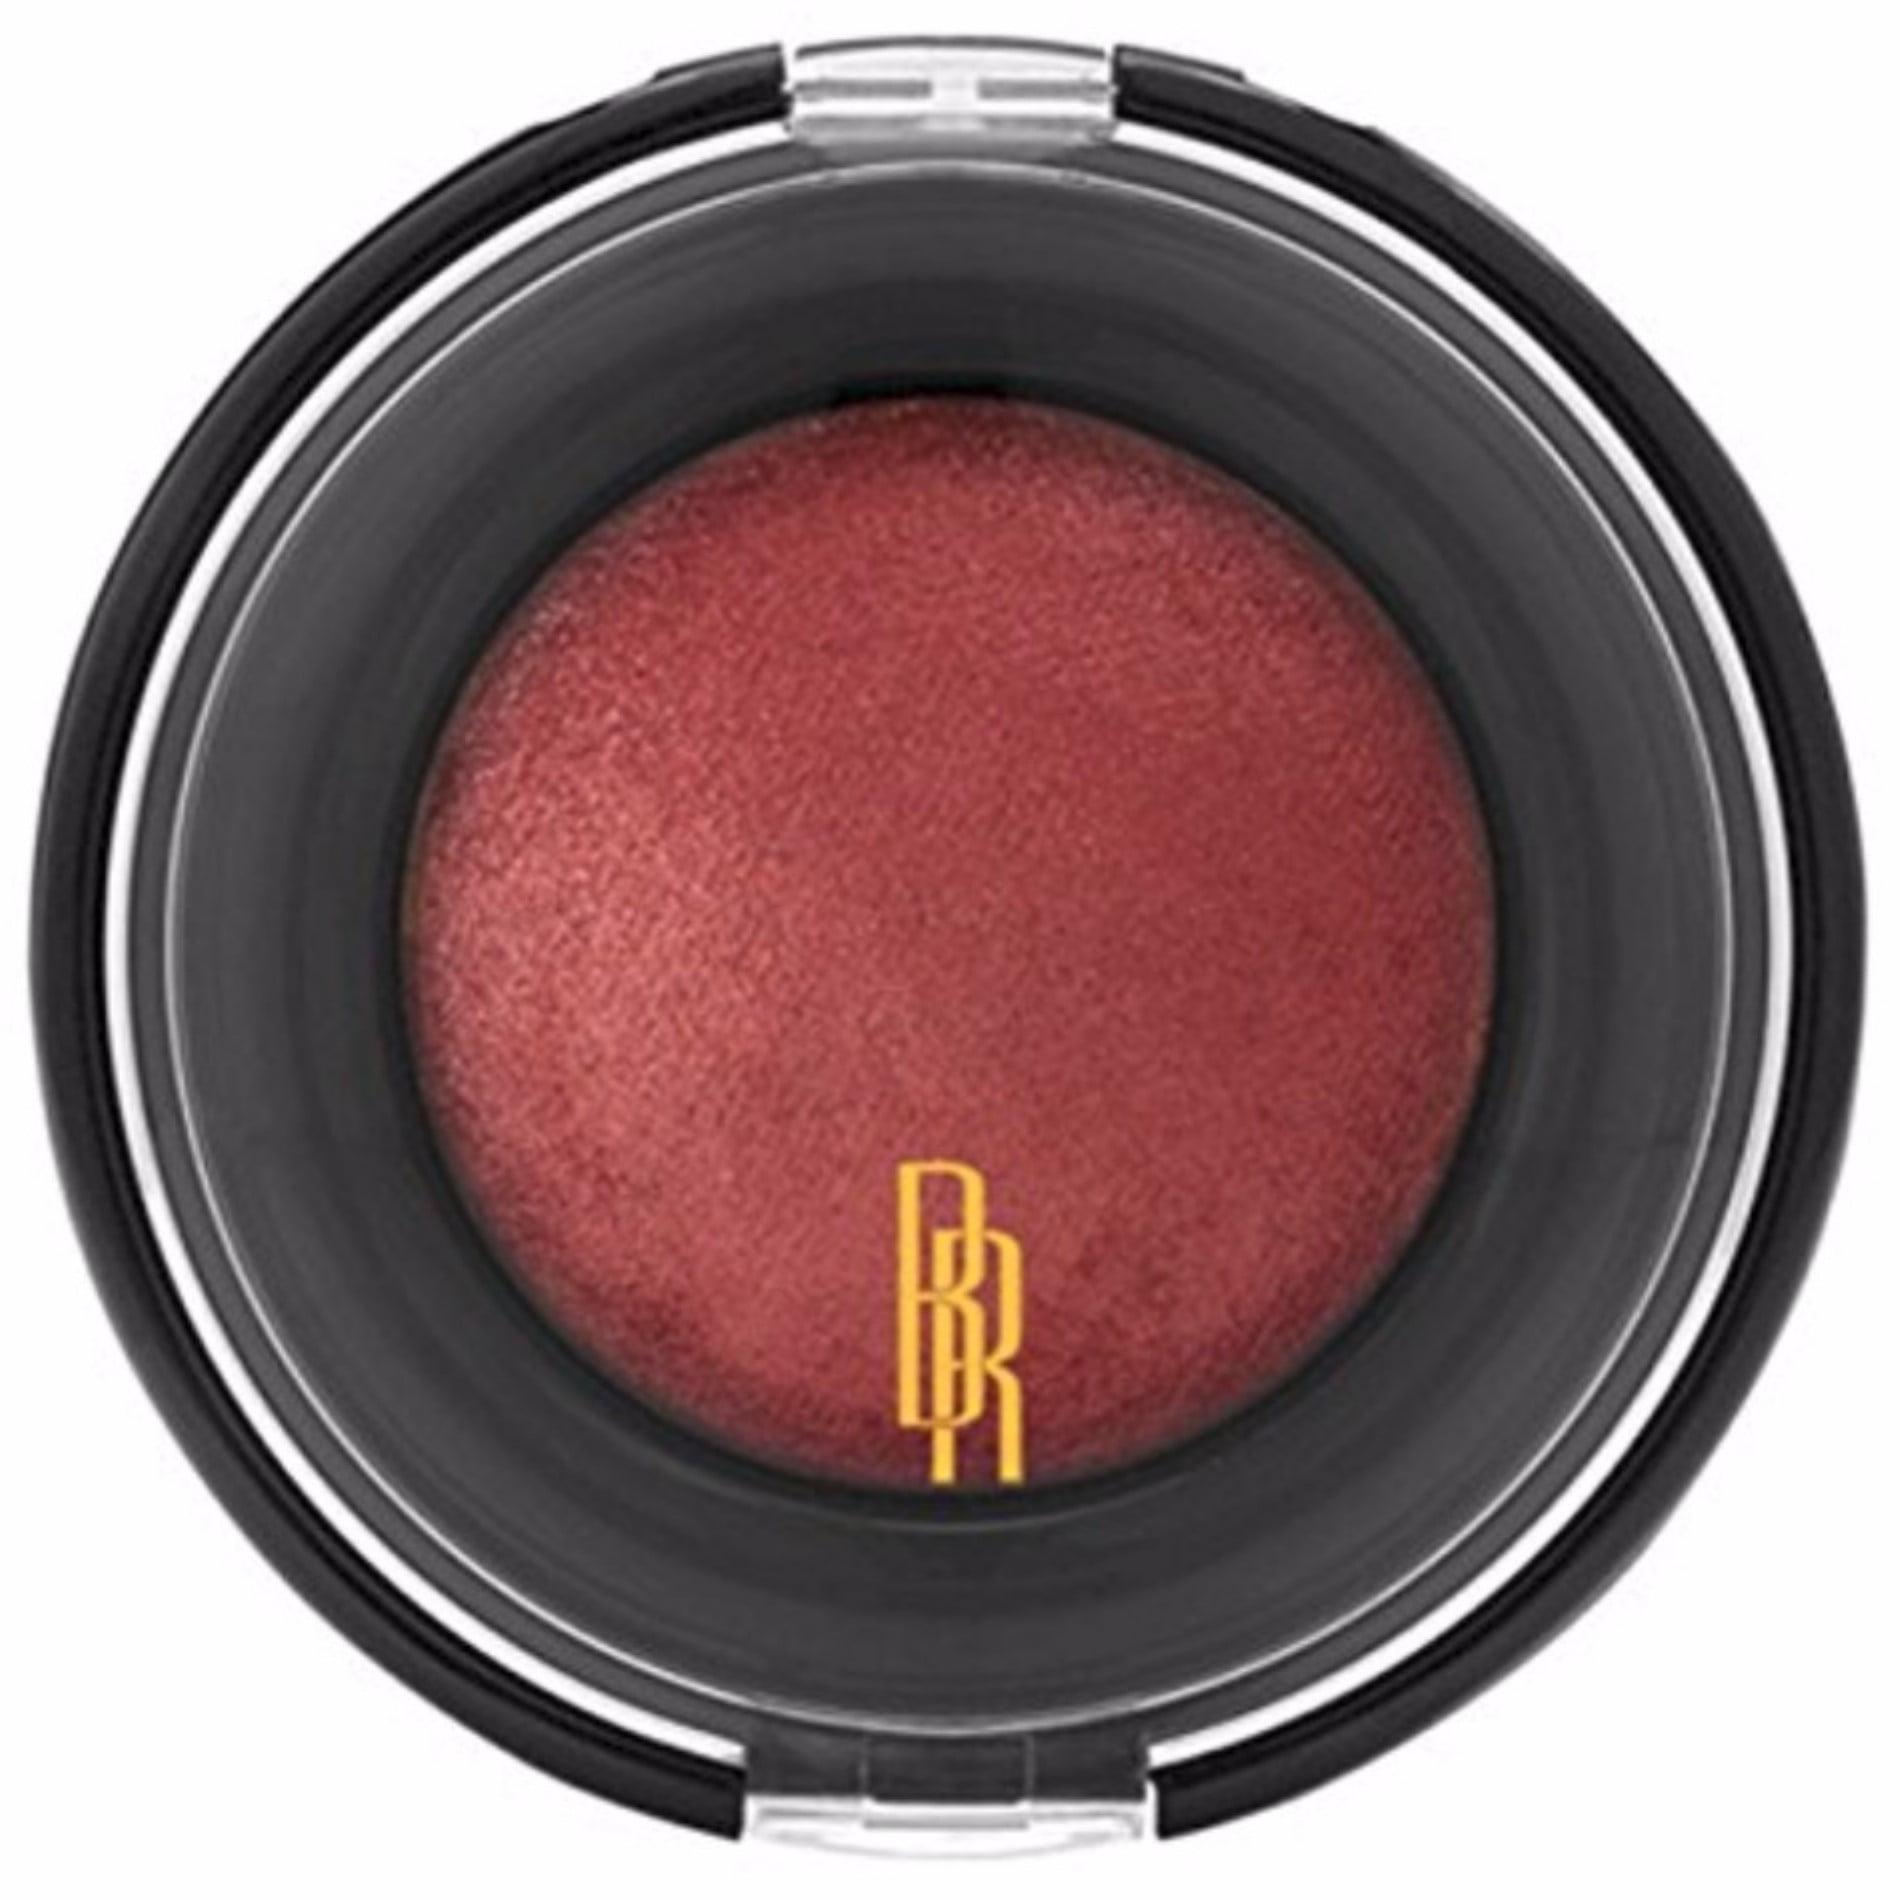 2 Pack - Black Radiance Artisan Color Baked Blush, Raspberry 0.1 oz